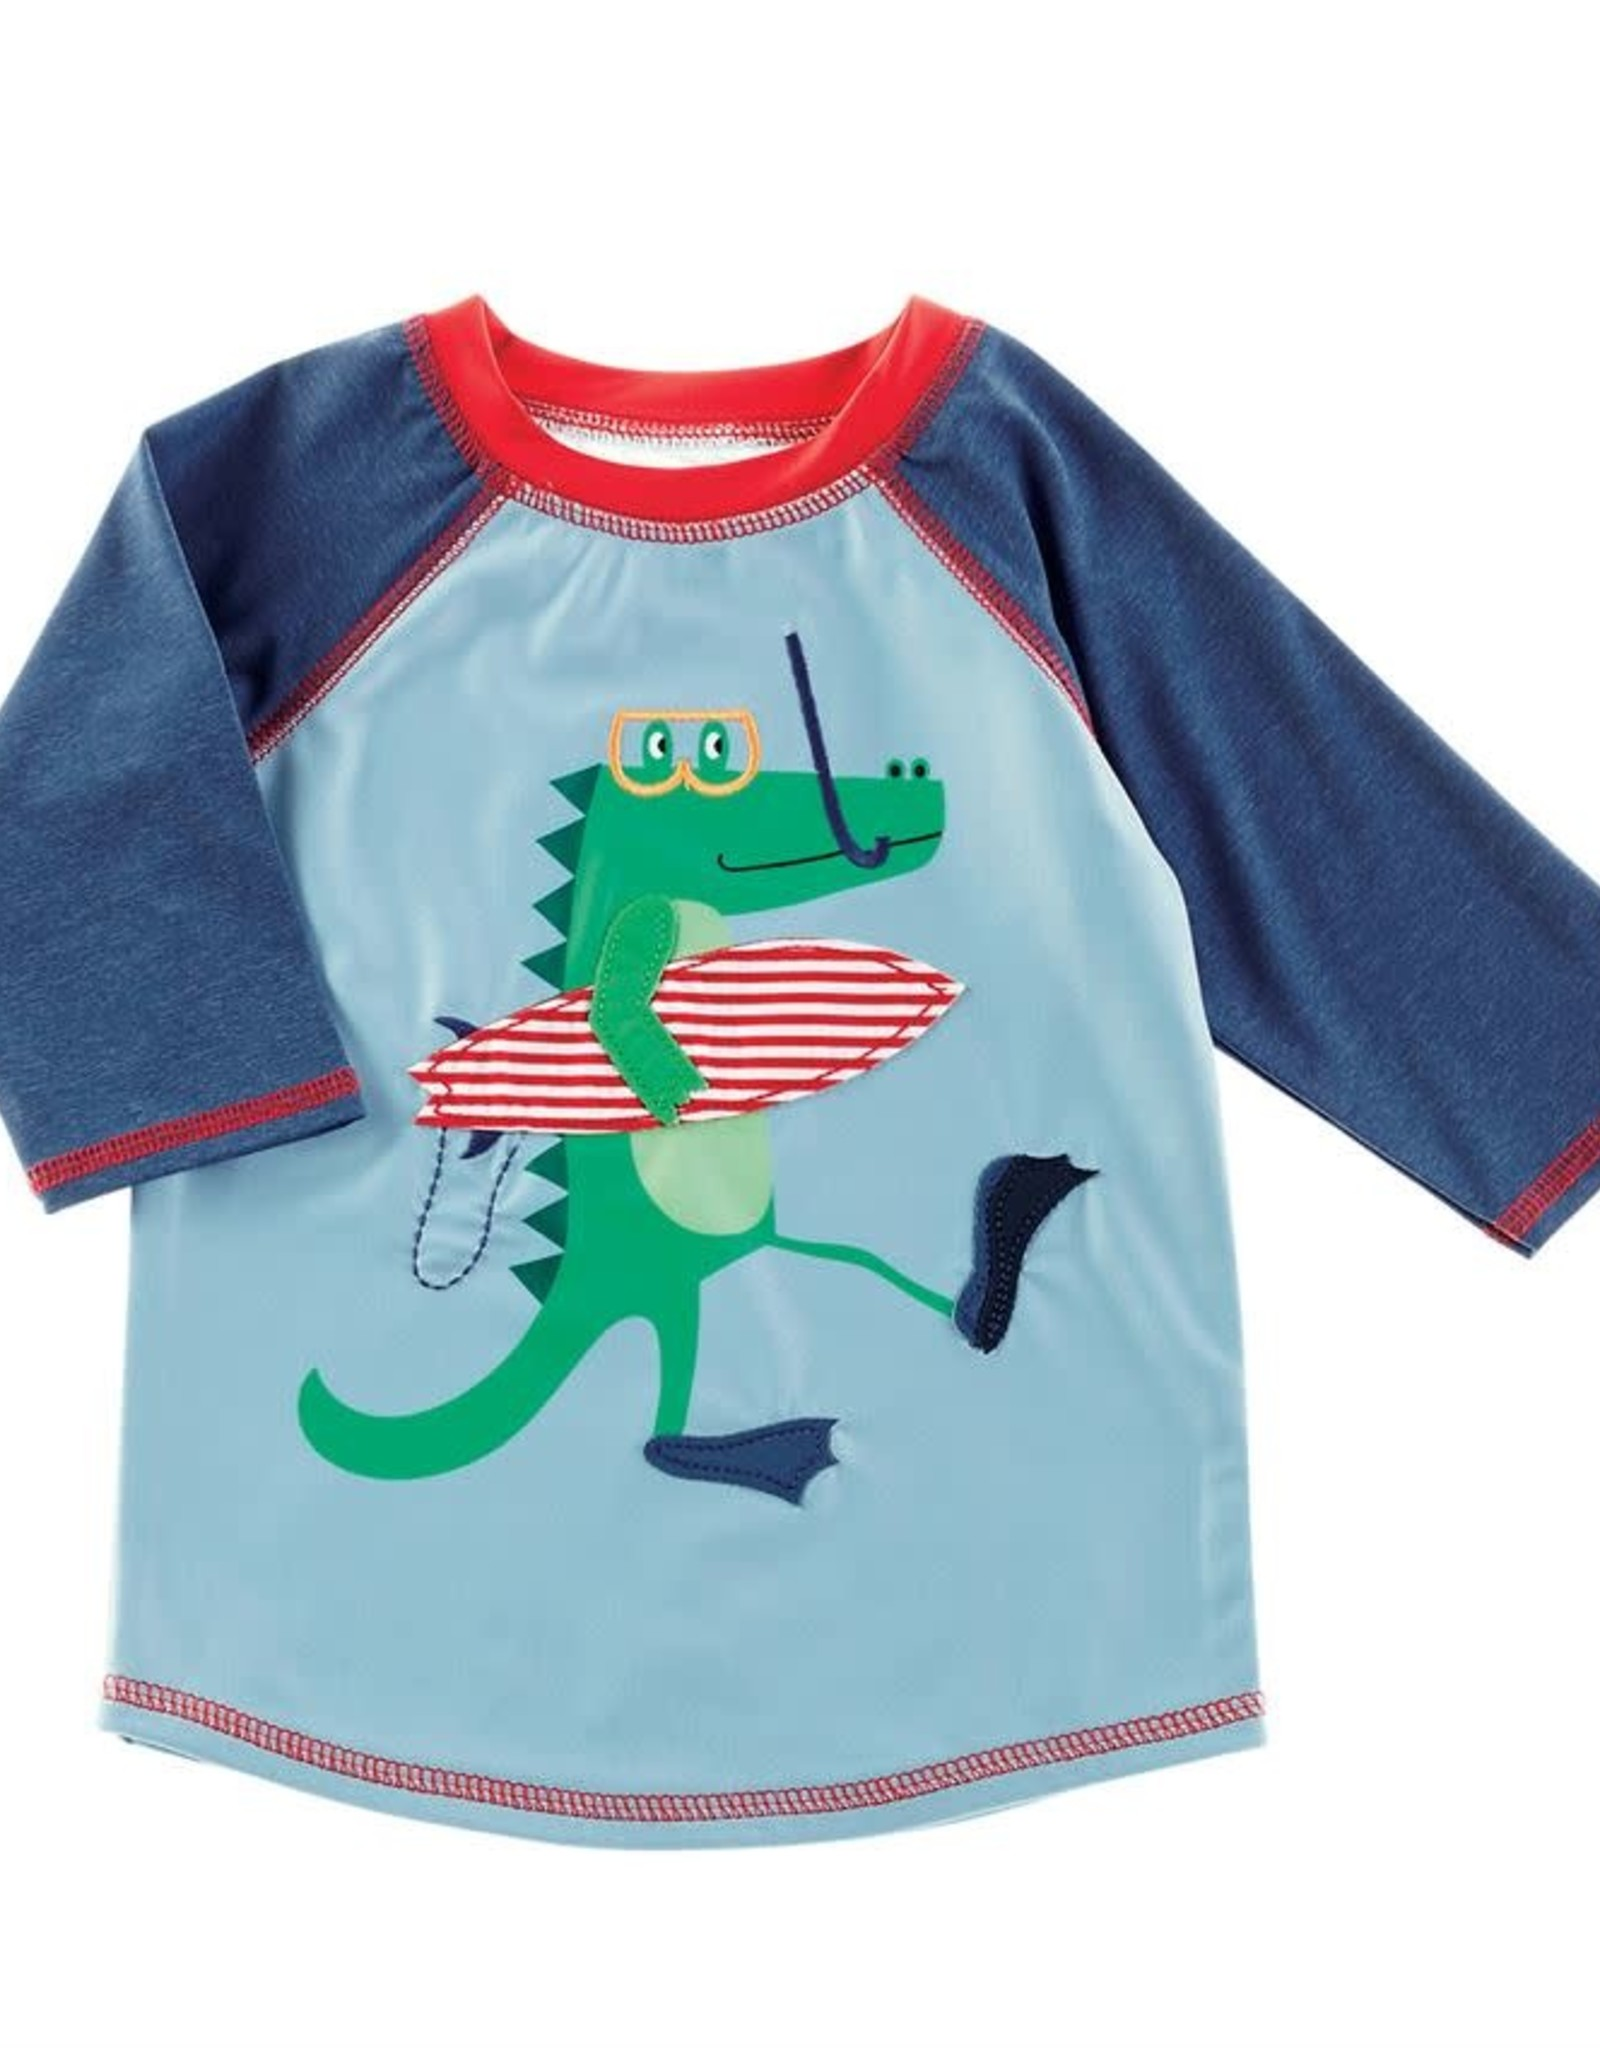 Alligator Rash Guard